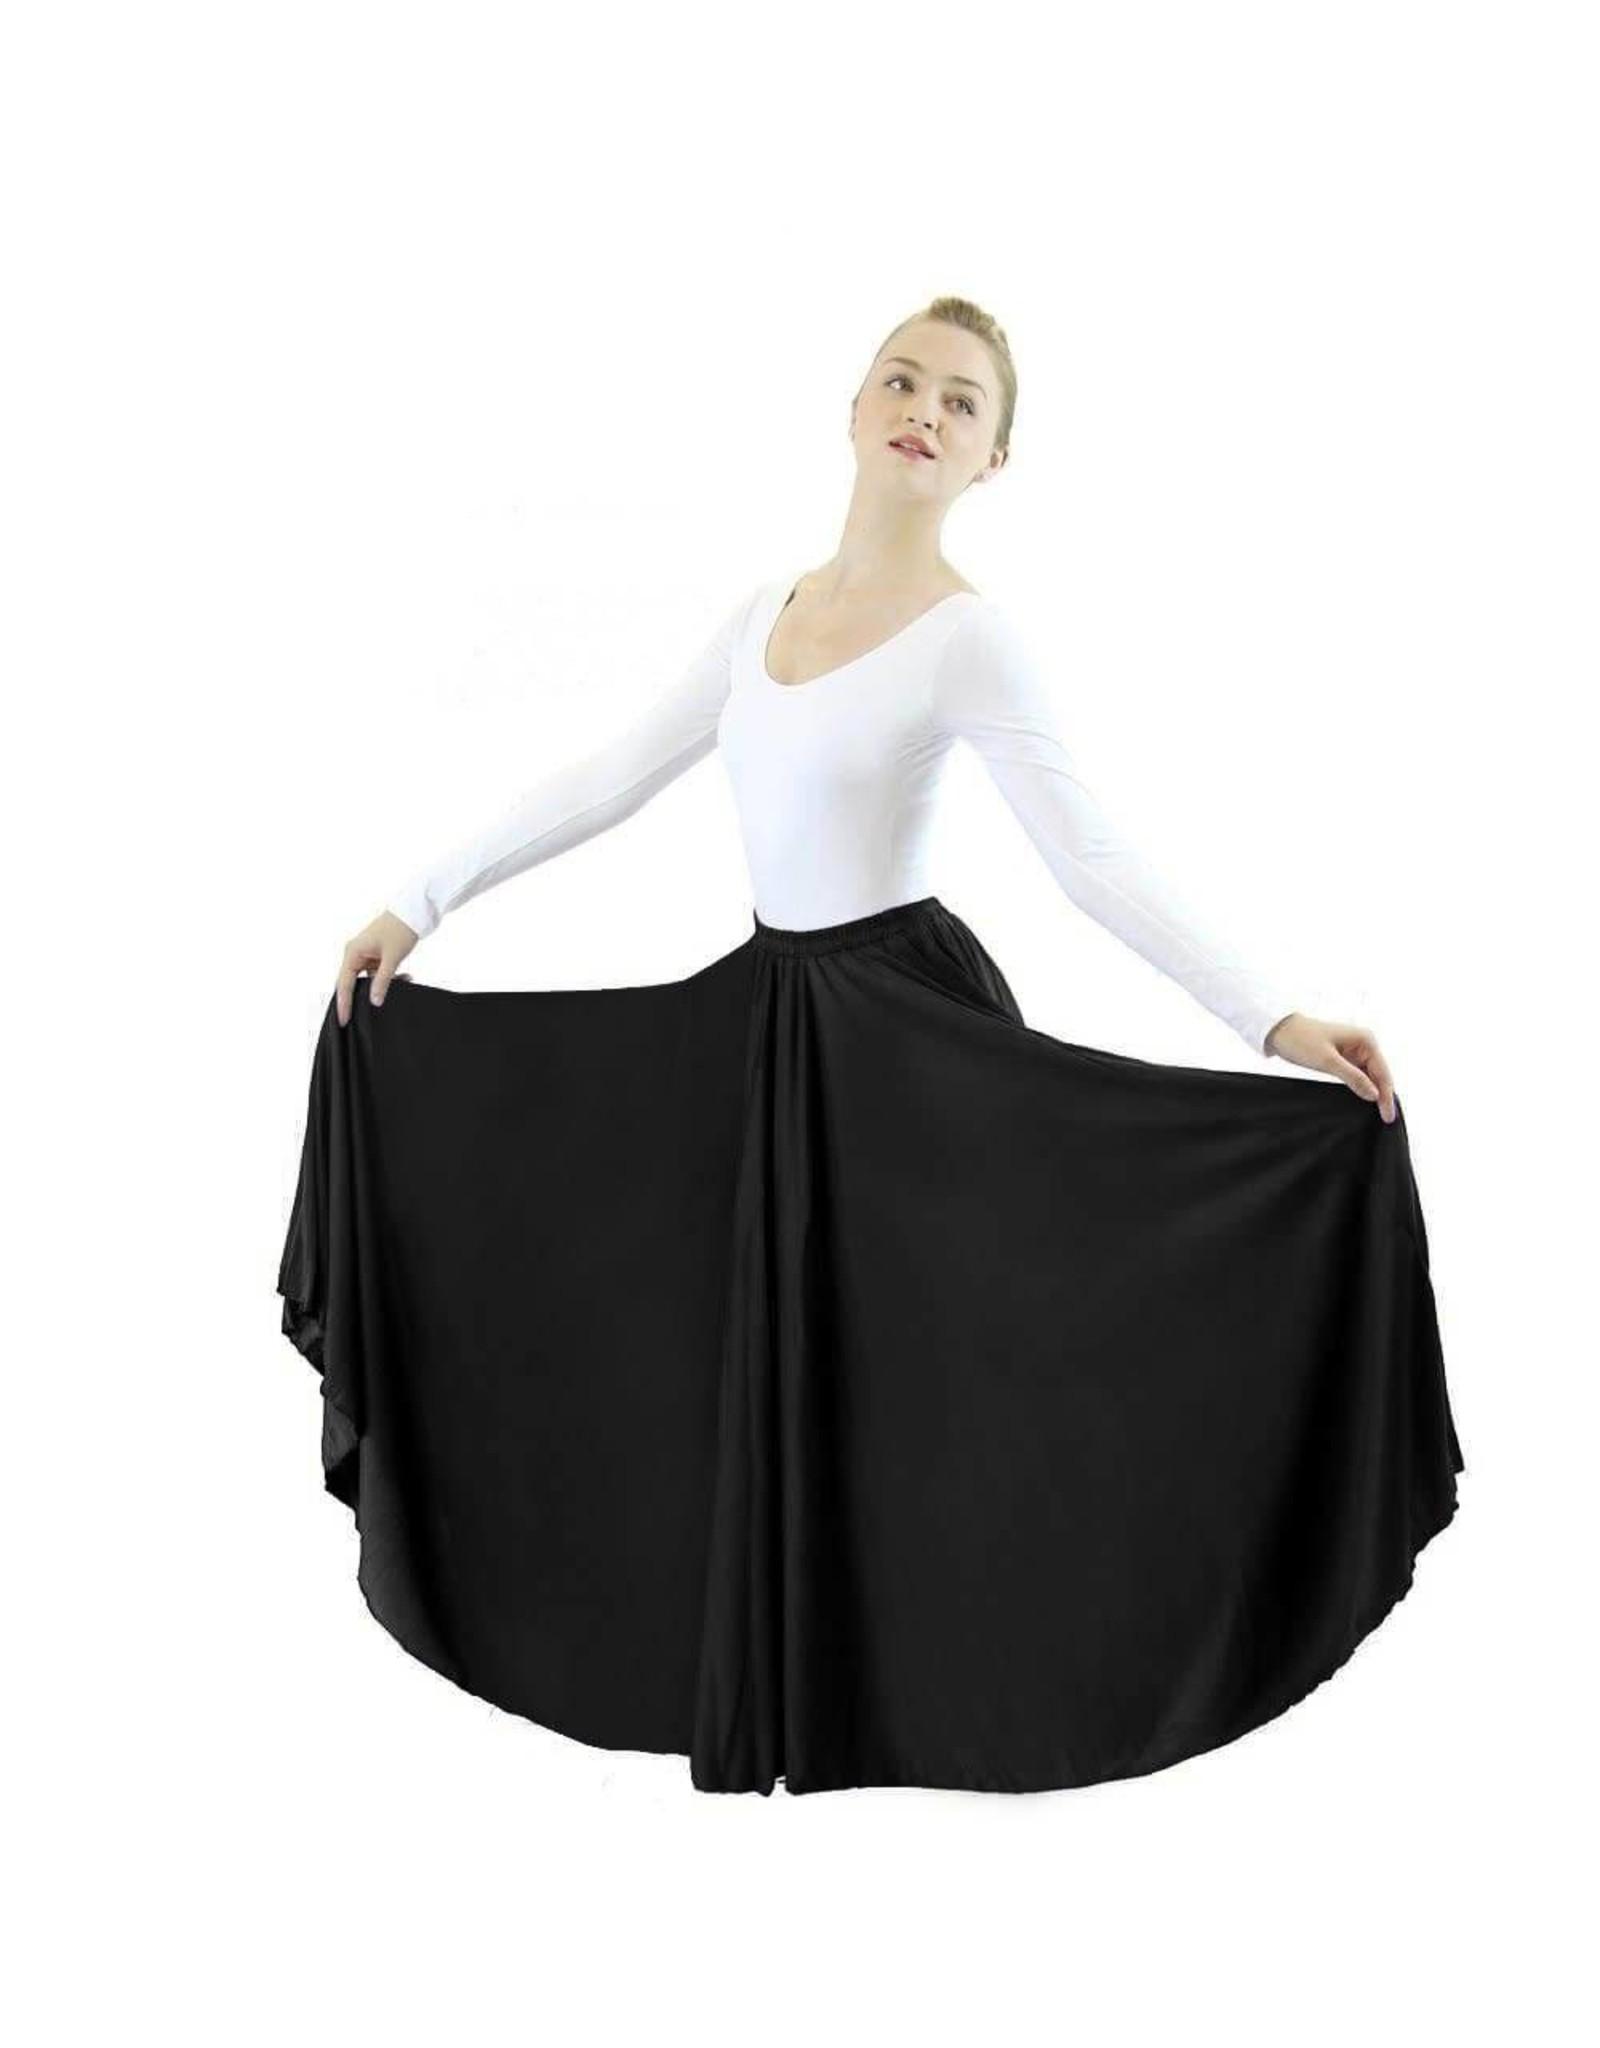 "Eurotard 13778k- Child 25"" Circle Skirt Black OSFA"